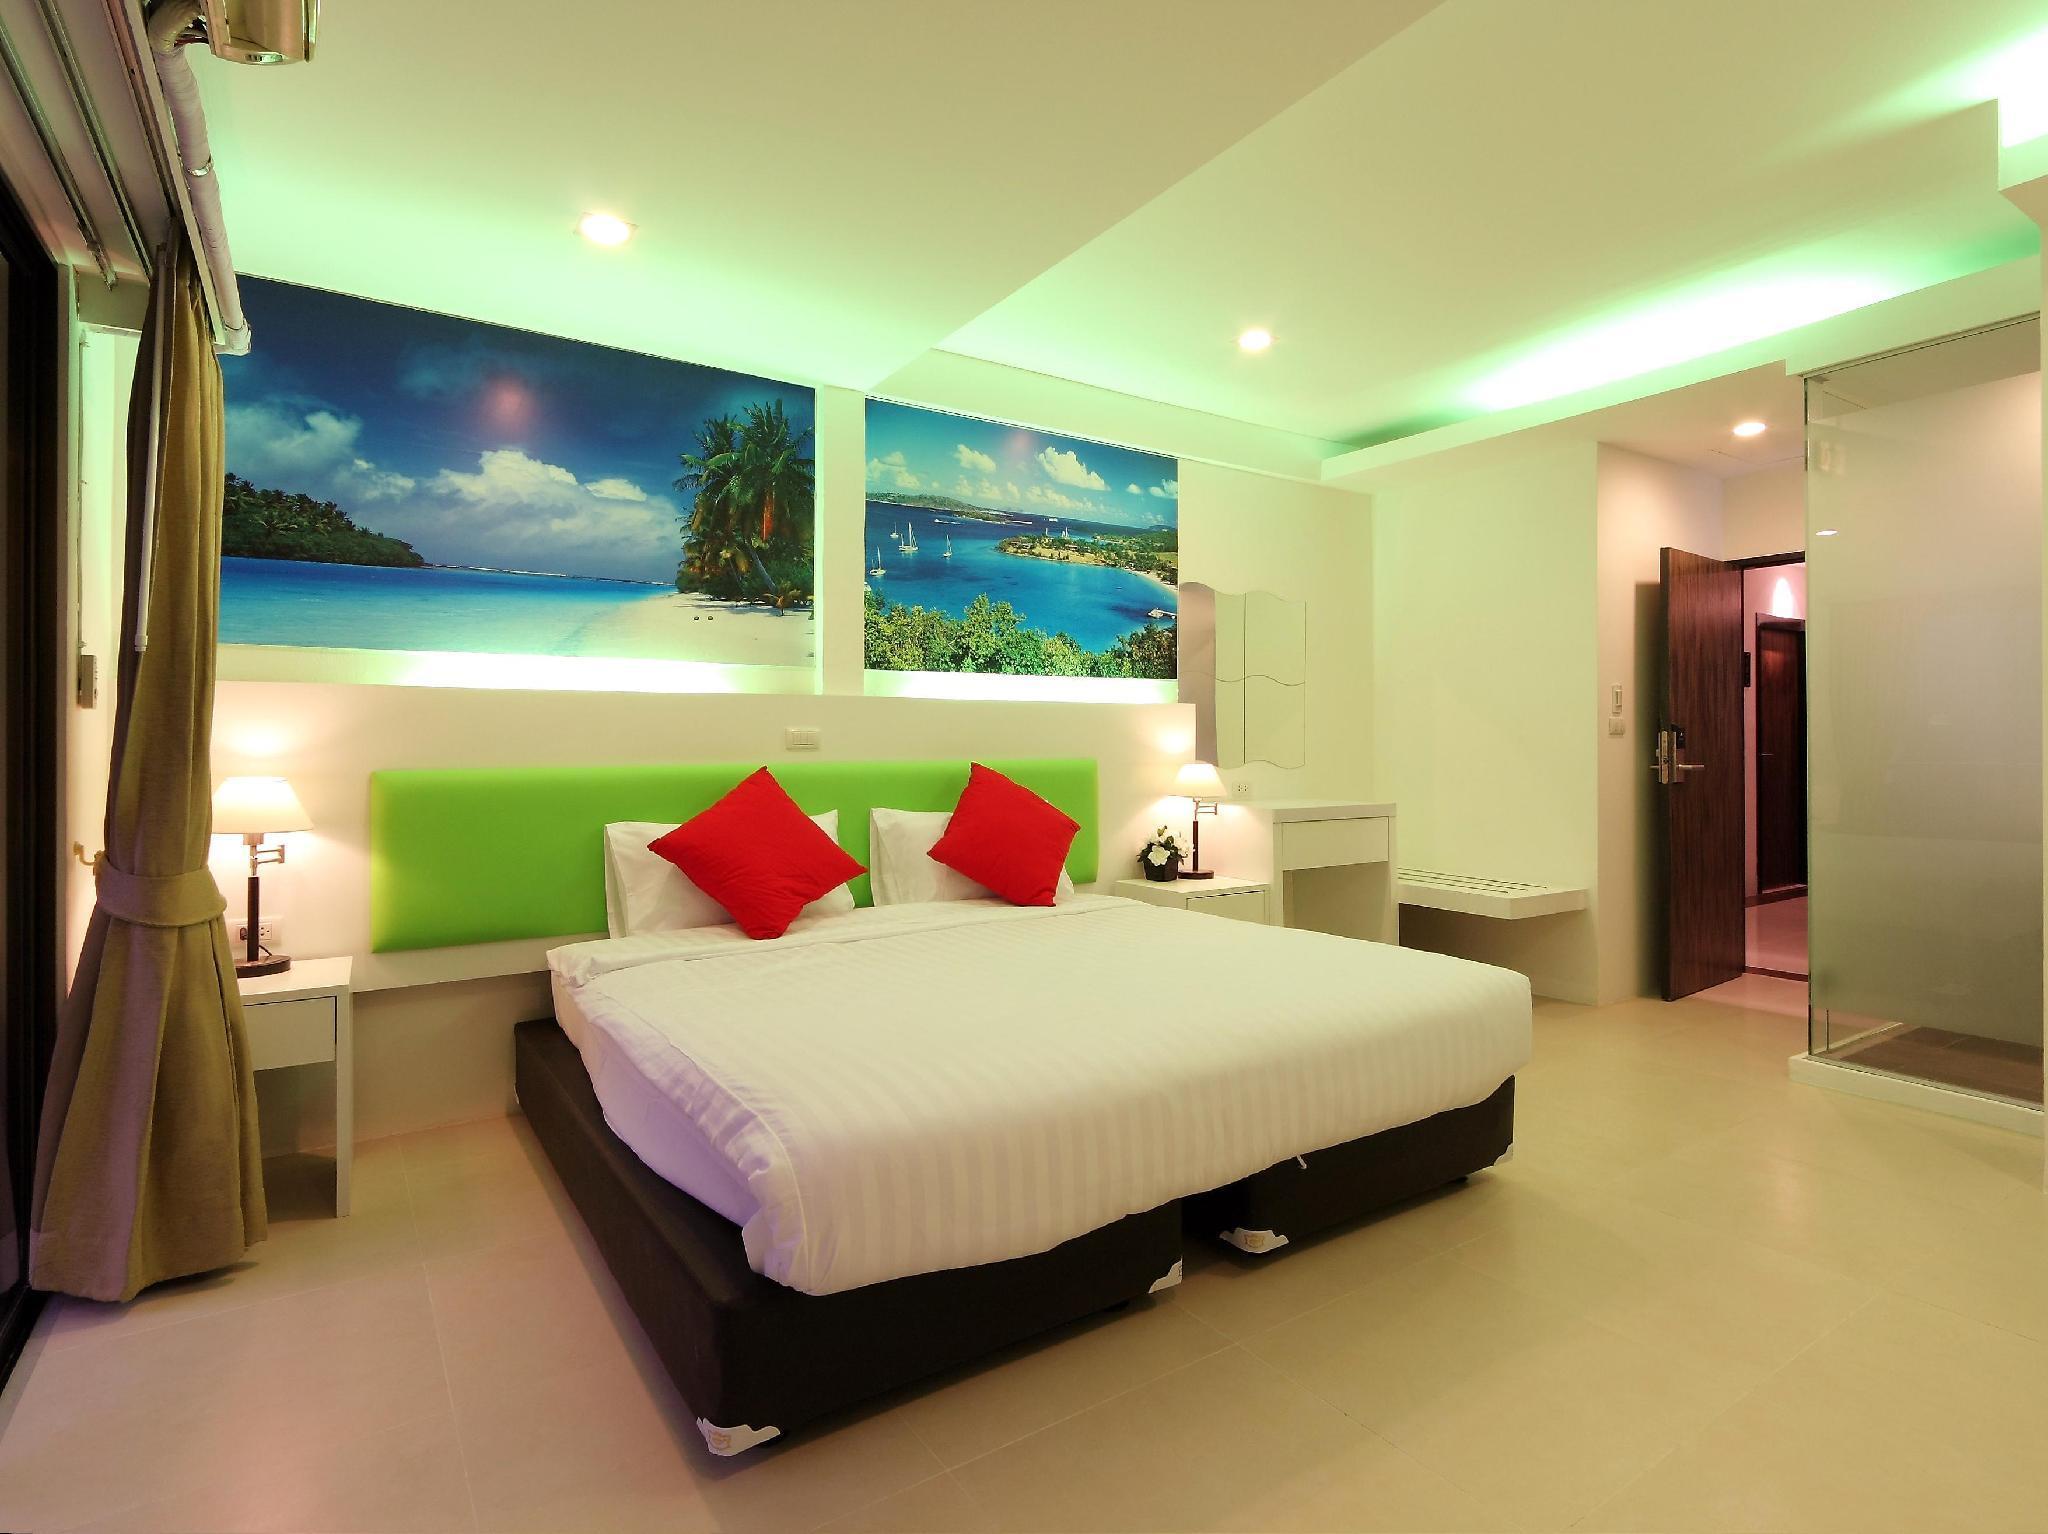 Armoni Patong Beach Hotel, Pulau Phuket